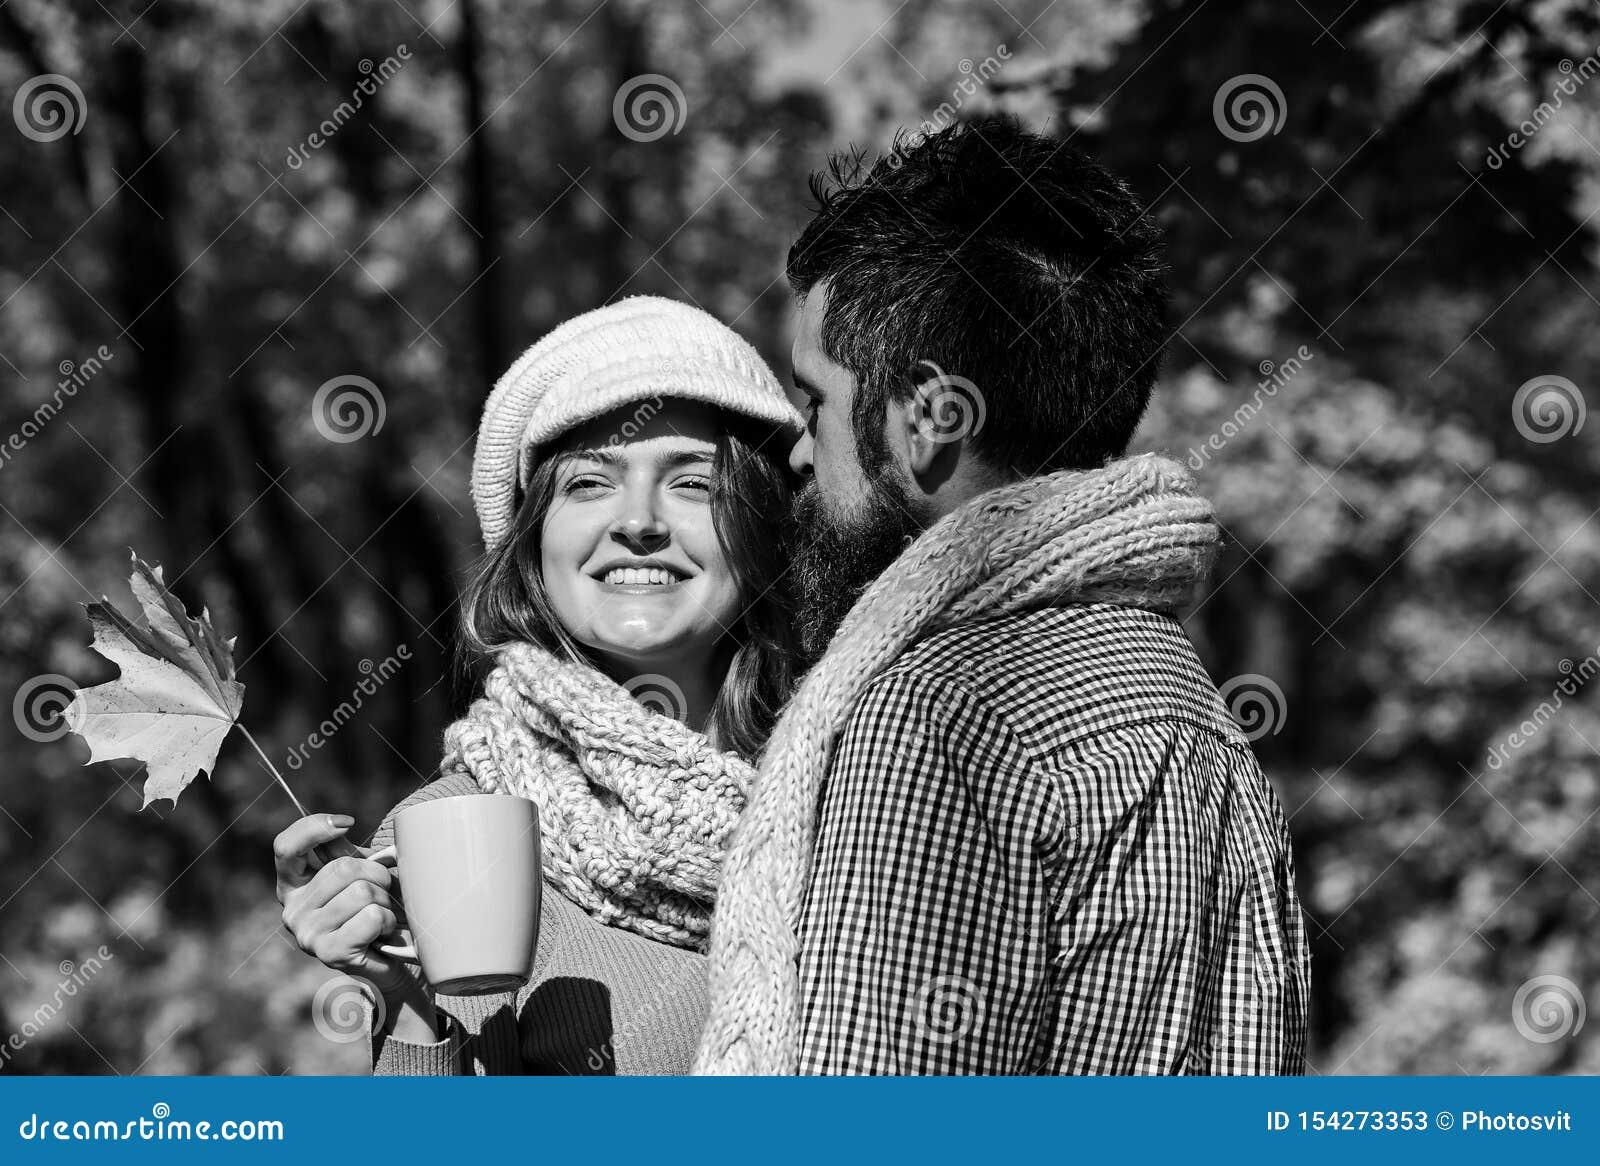 Girl and bearded guy or happy lovers on date hug